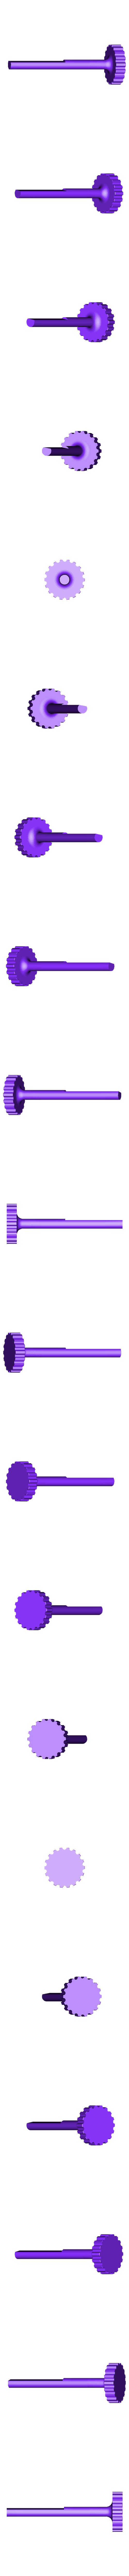 shaft.stl Download free STL file USB Microscope stand - very rigid, two axis • 3D printable template, maciejkobuszewski